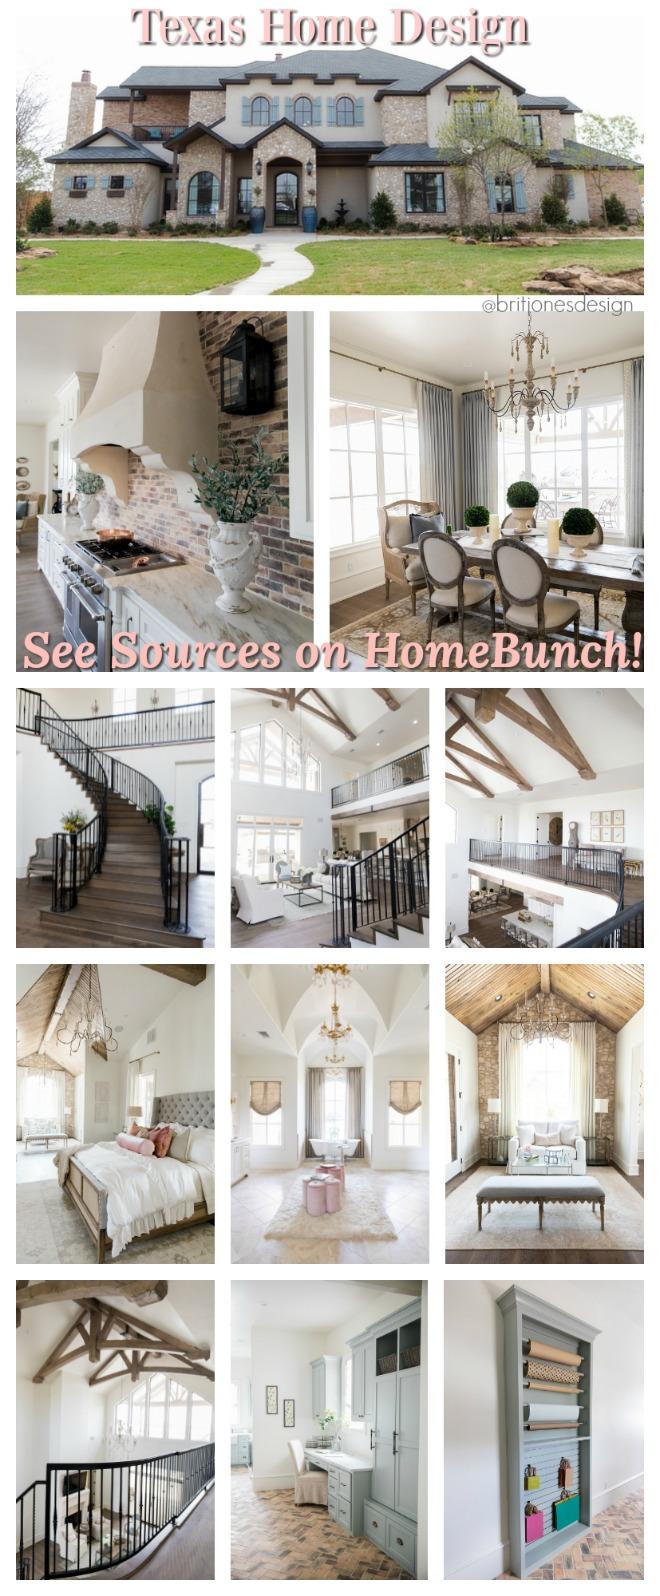 Texas Home Design